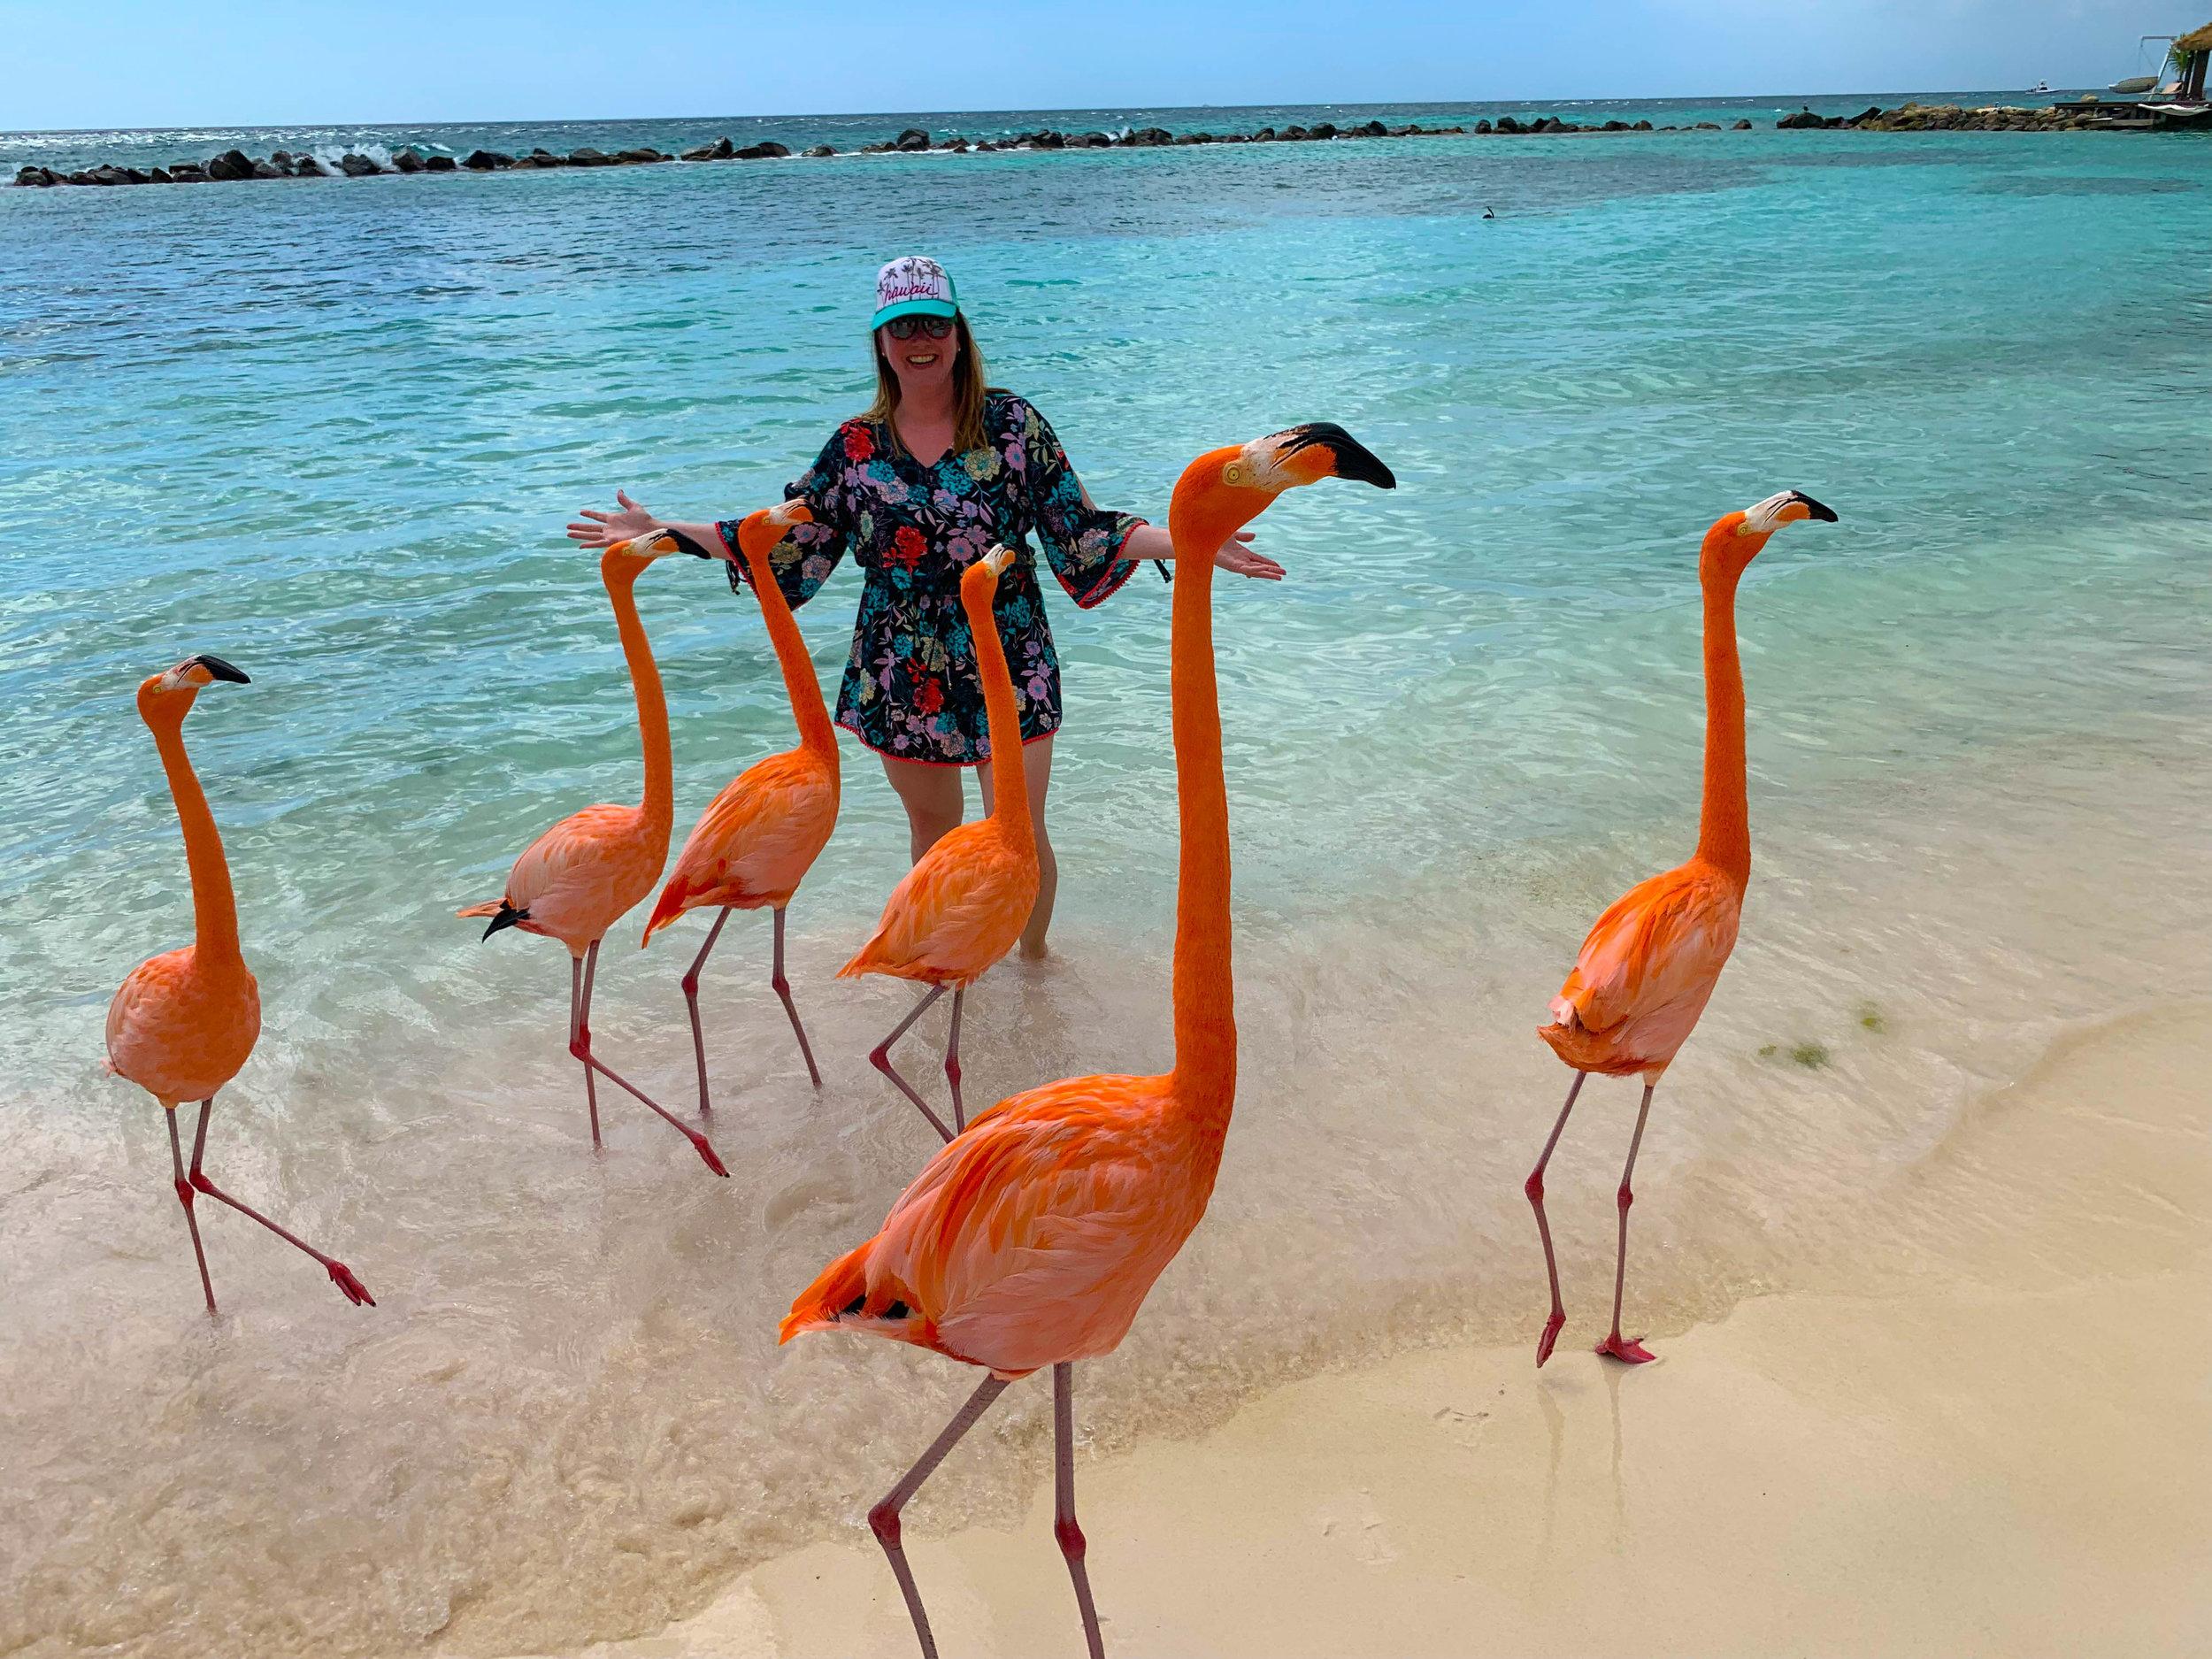 Aruba-Flamingo-Island.jpg